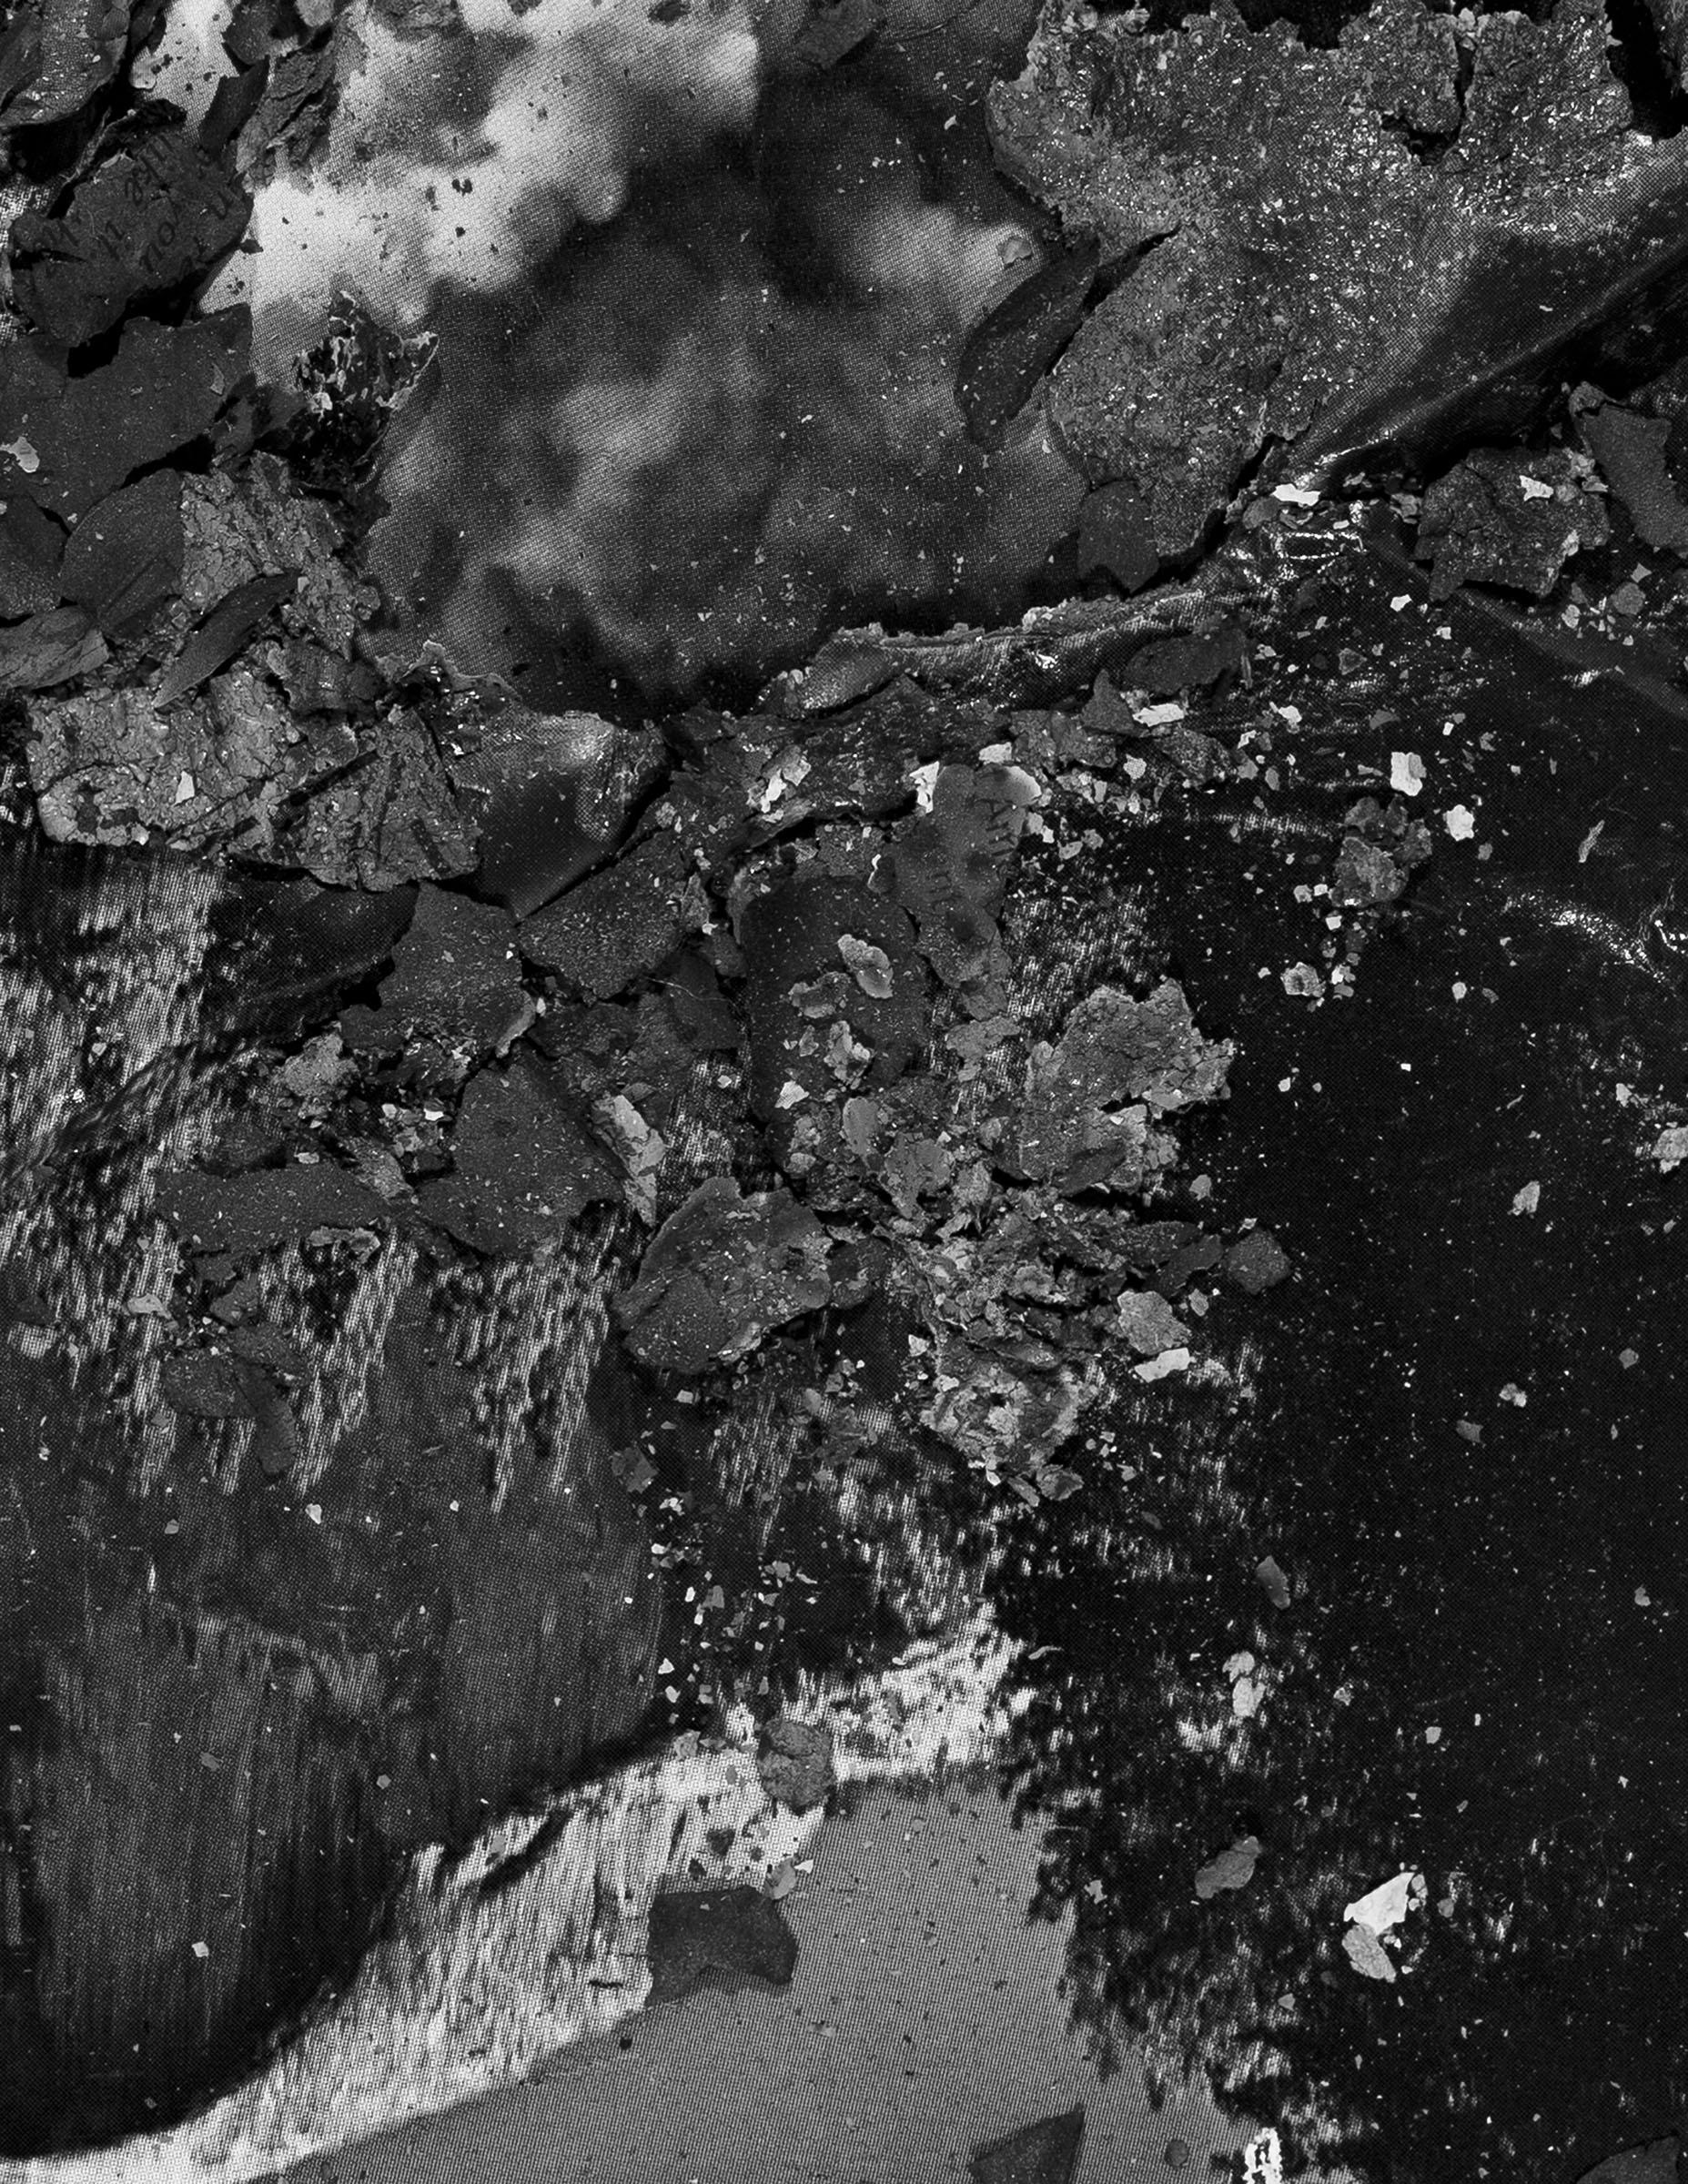 "BESSMA KHALAF (detail)  Burnout (Half Dome) , 2019 Archival pigment print 26"" x 20"", Edition of 3 with 1AP"